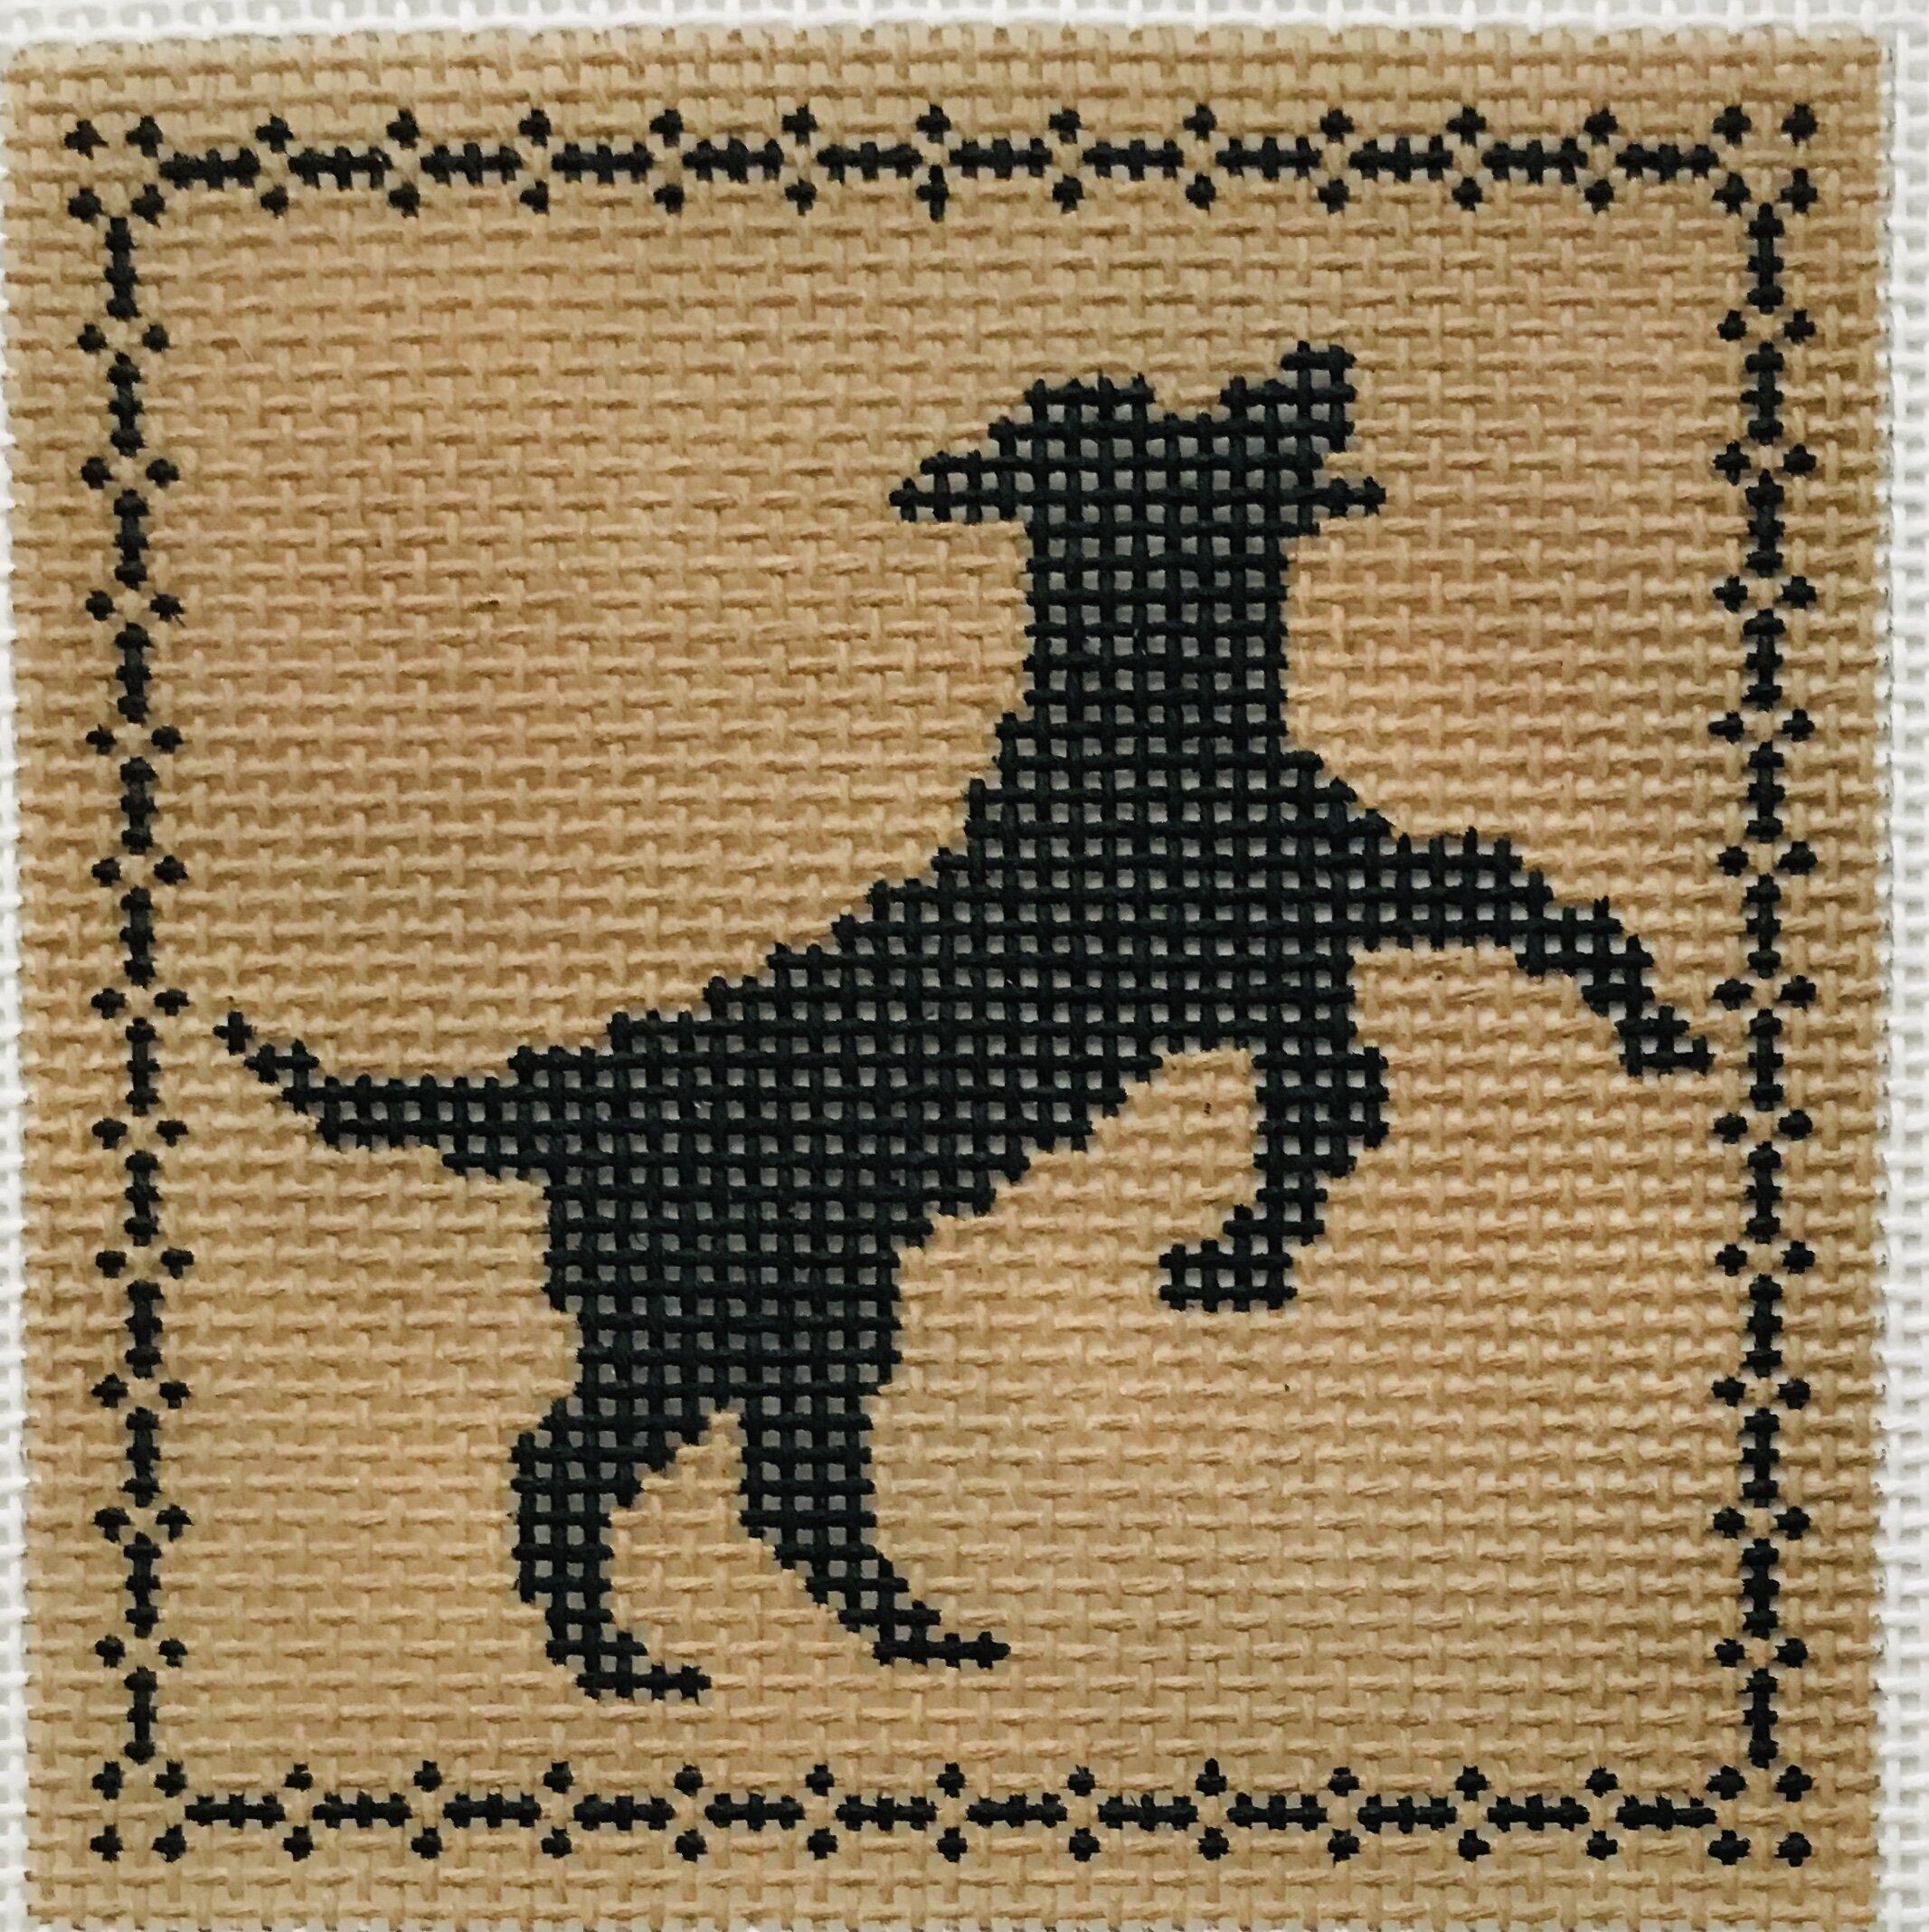 "Leaping Labrador AL129   4"" x 4"" on 14 mesh"